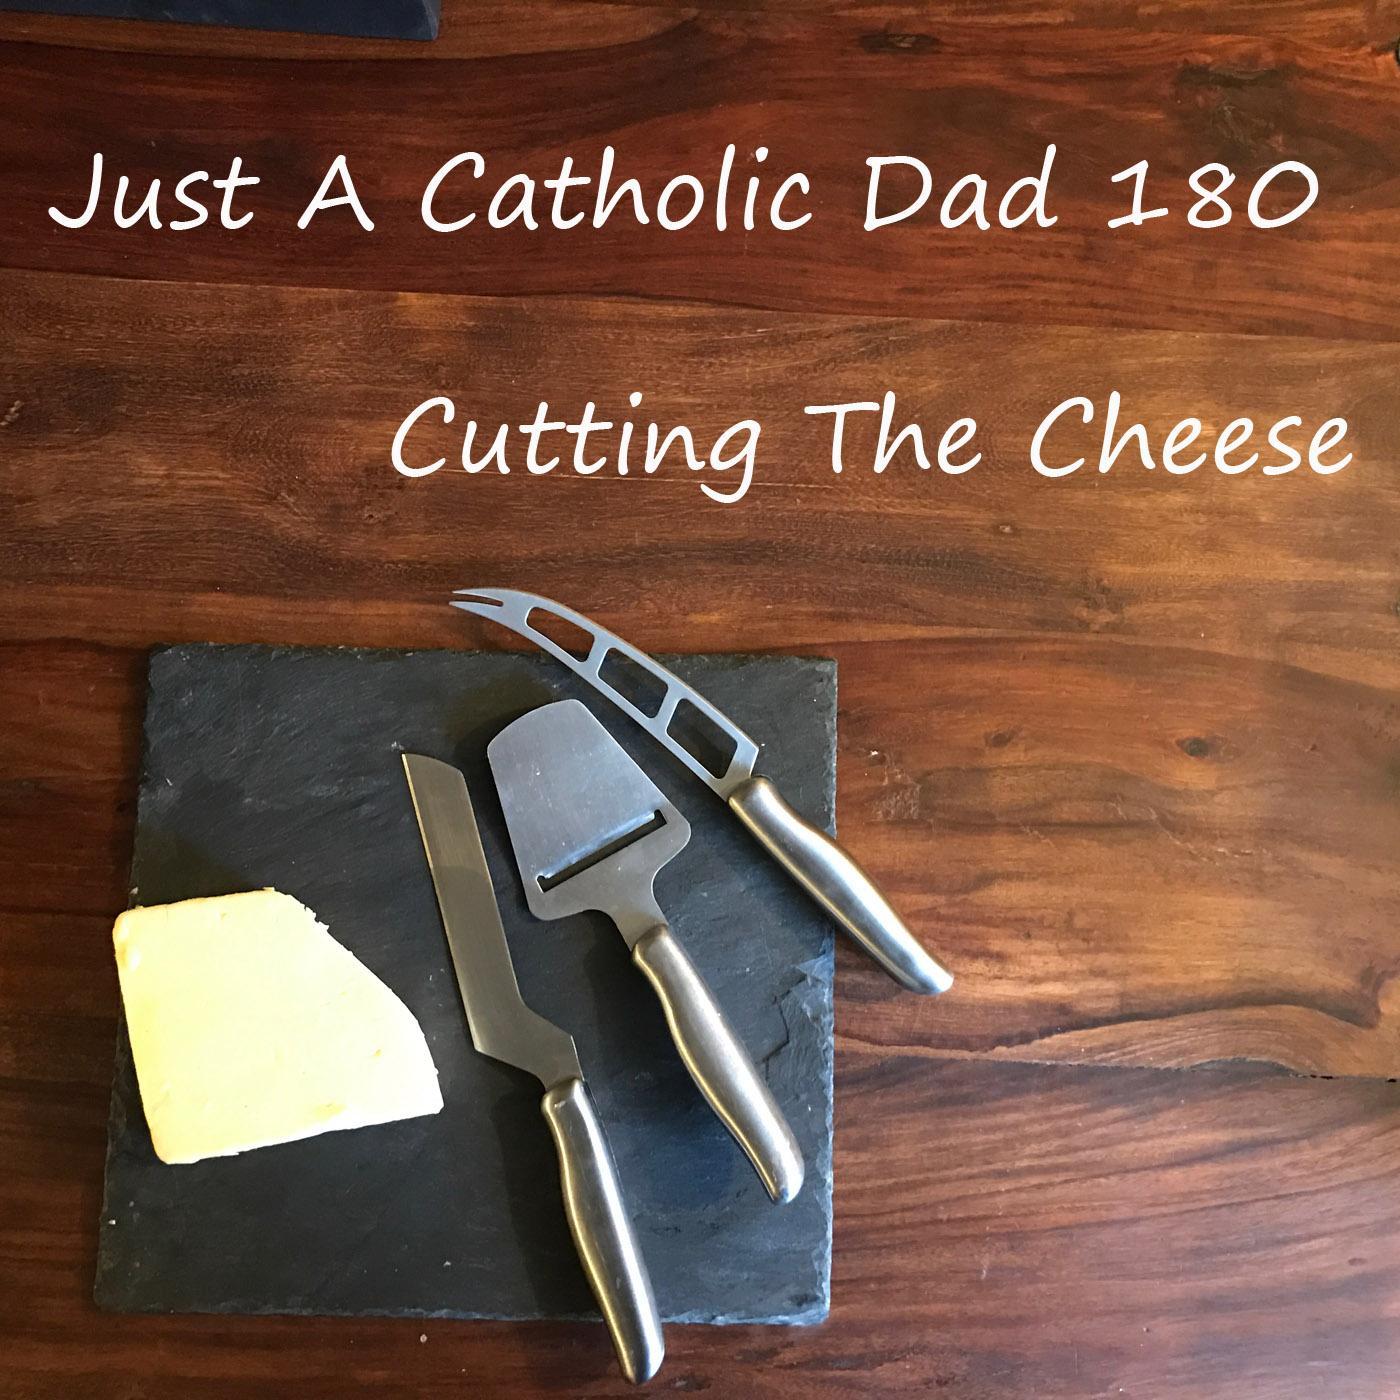 JACD 185 - Cutting The Cheese